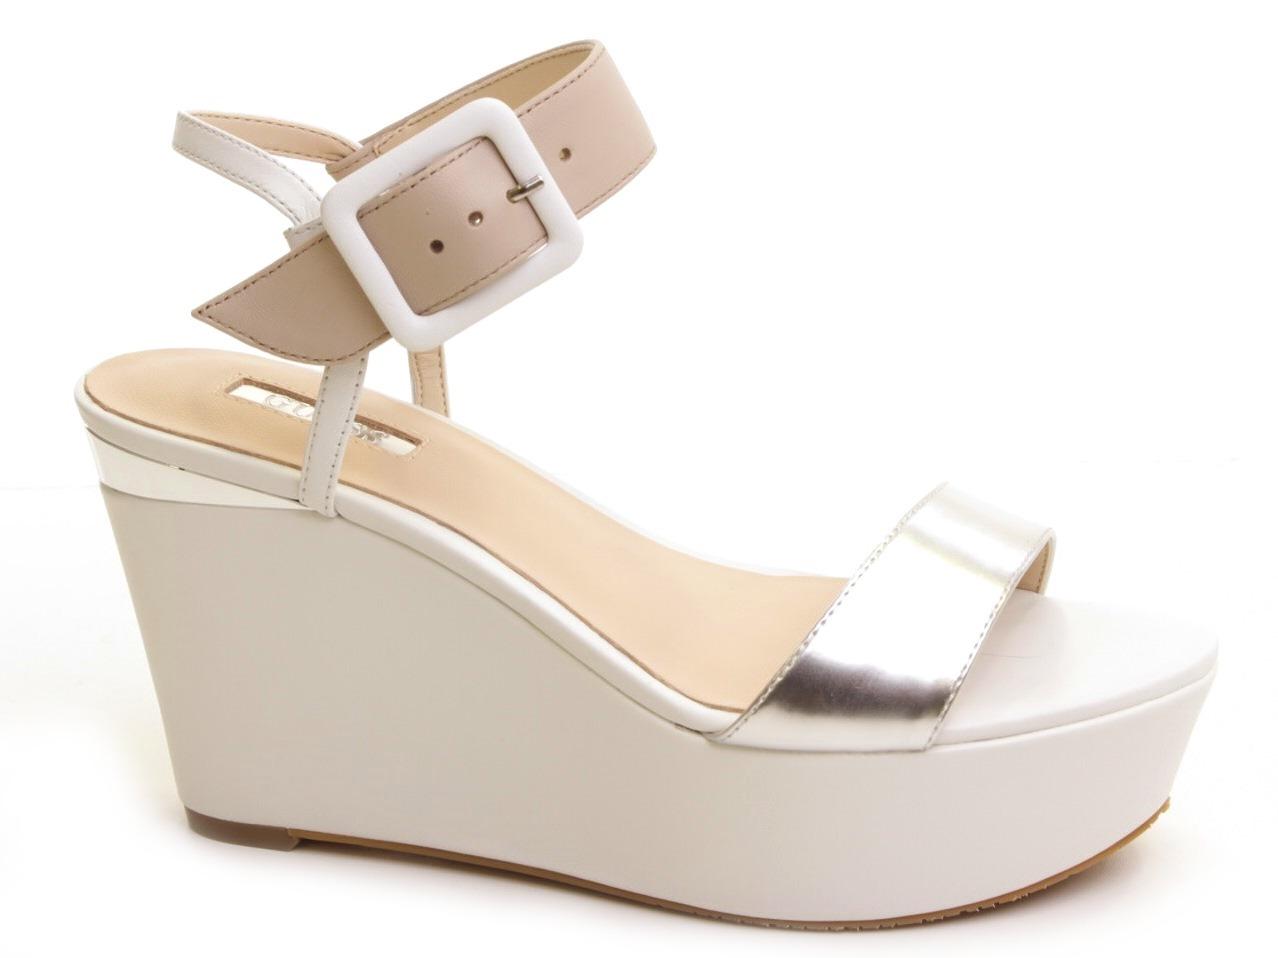 Wedge Sandals Guess - 465 FLDYI2 LEA03